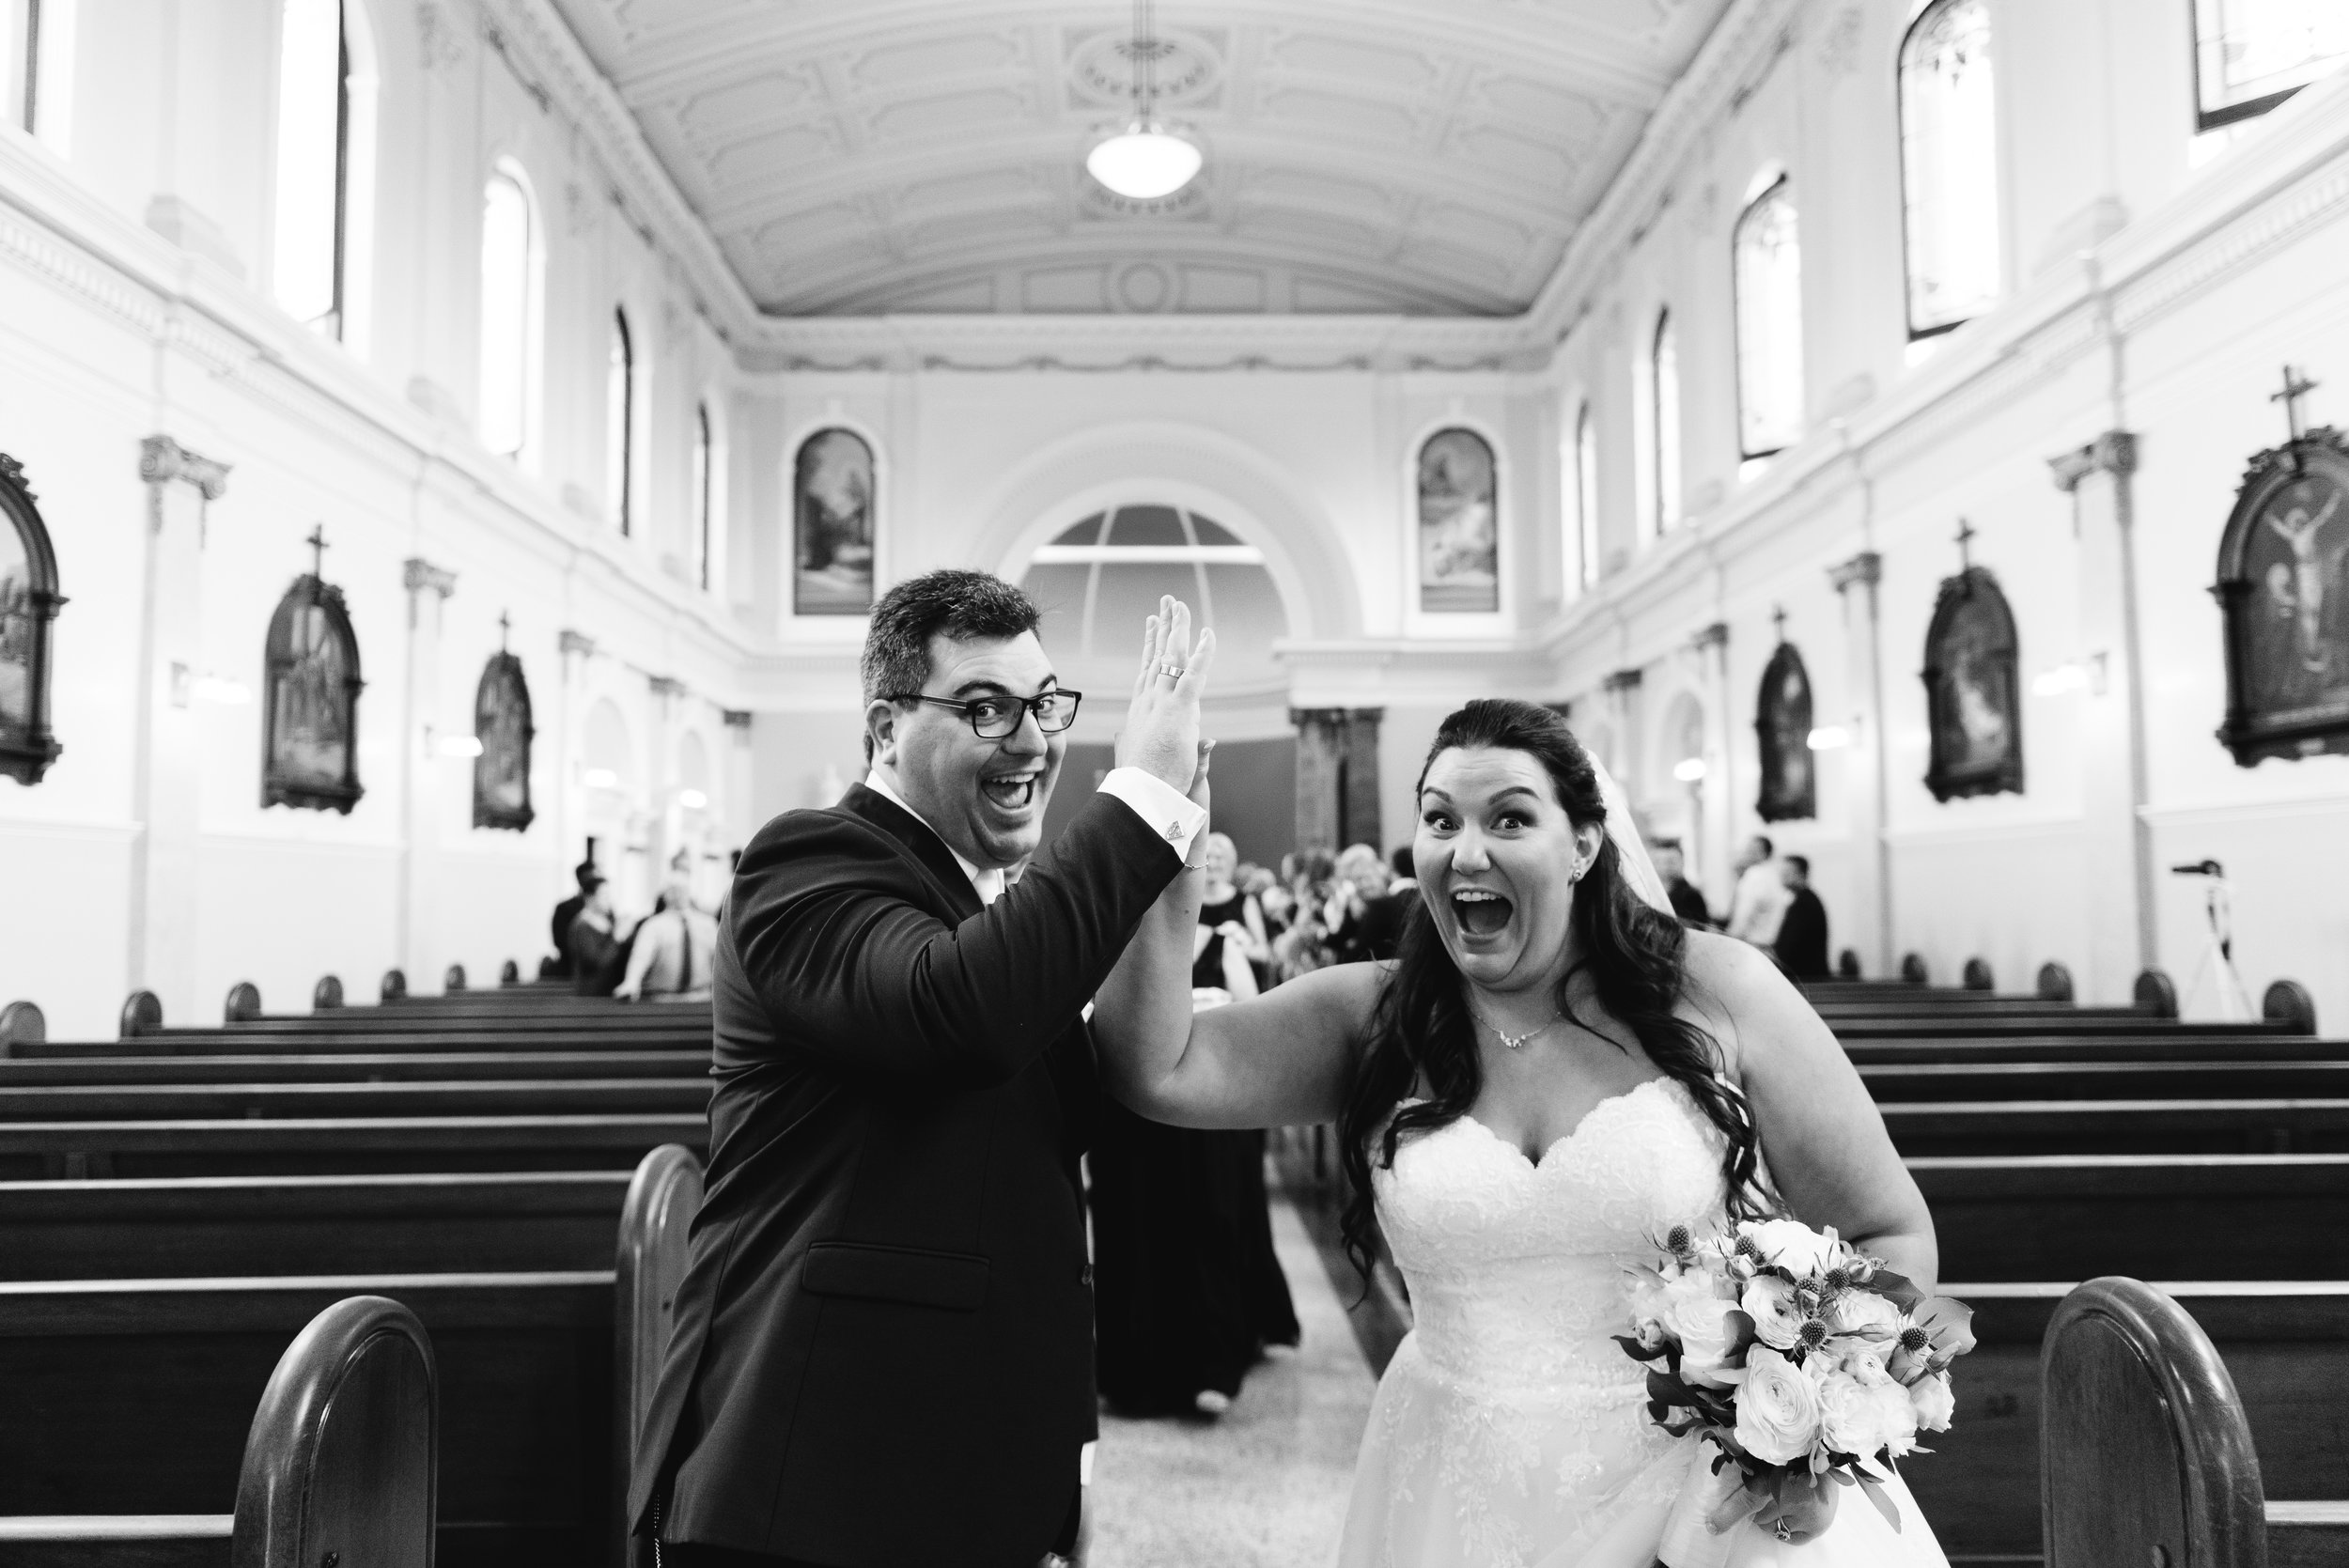 brisbane-wedding-photographer-56.jpg